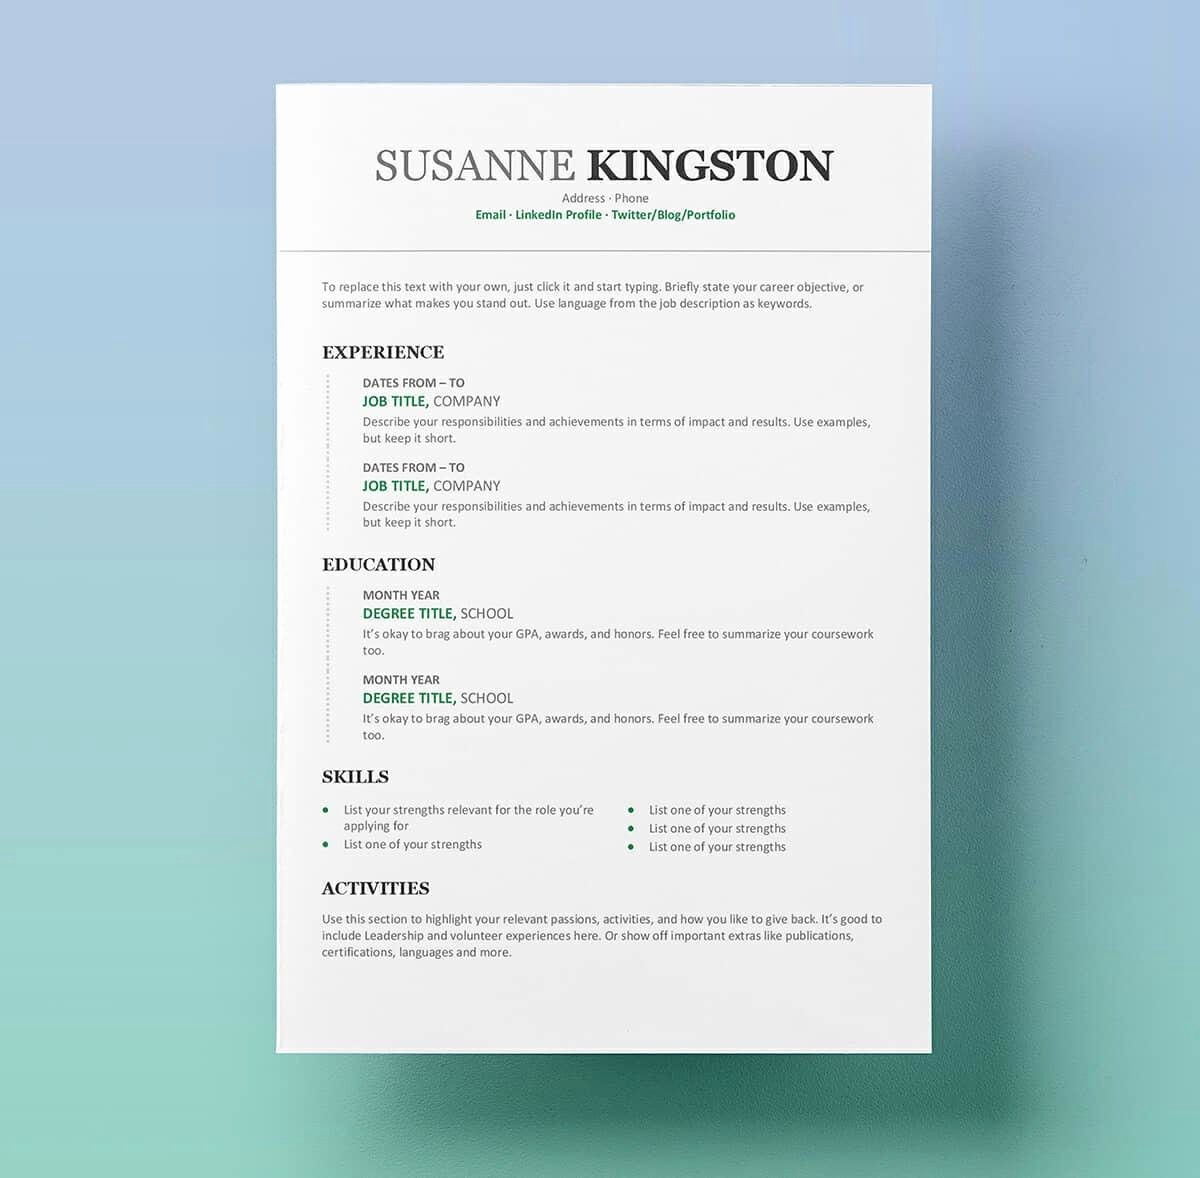 Download Resume Templates Microsoft Word Fresh Resume Templates for Word Free 15 Examples for Download